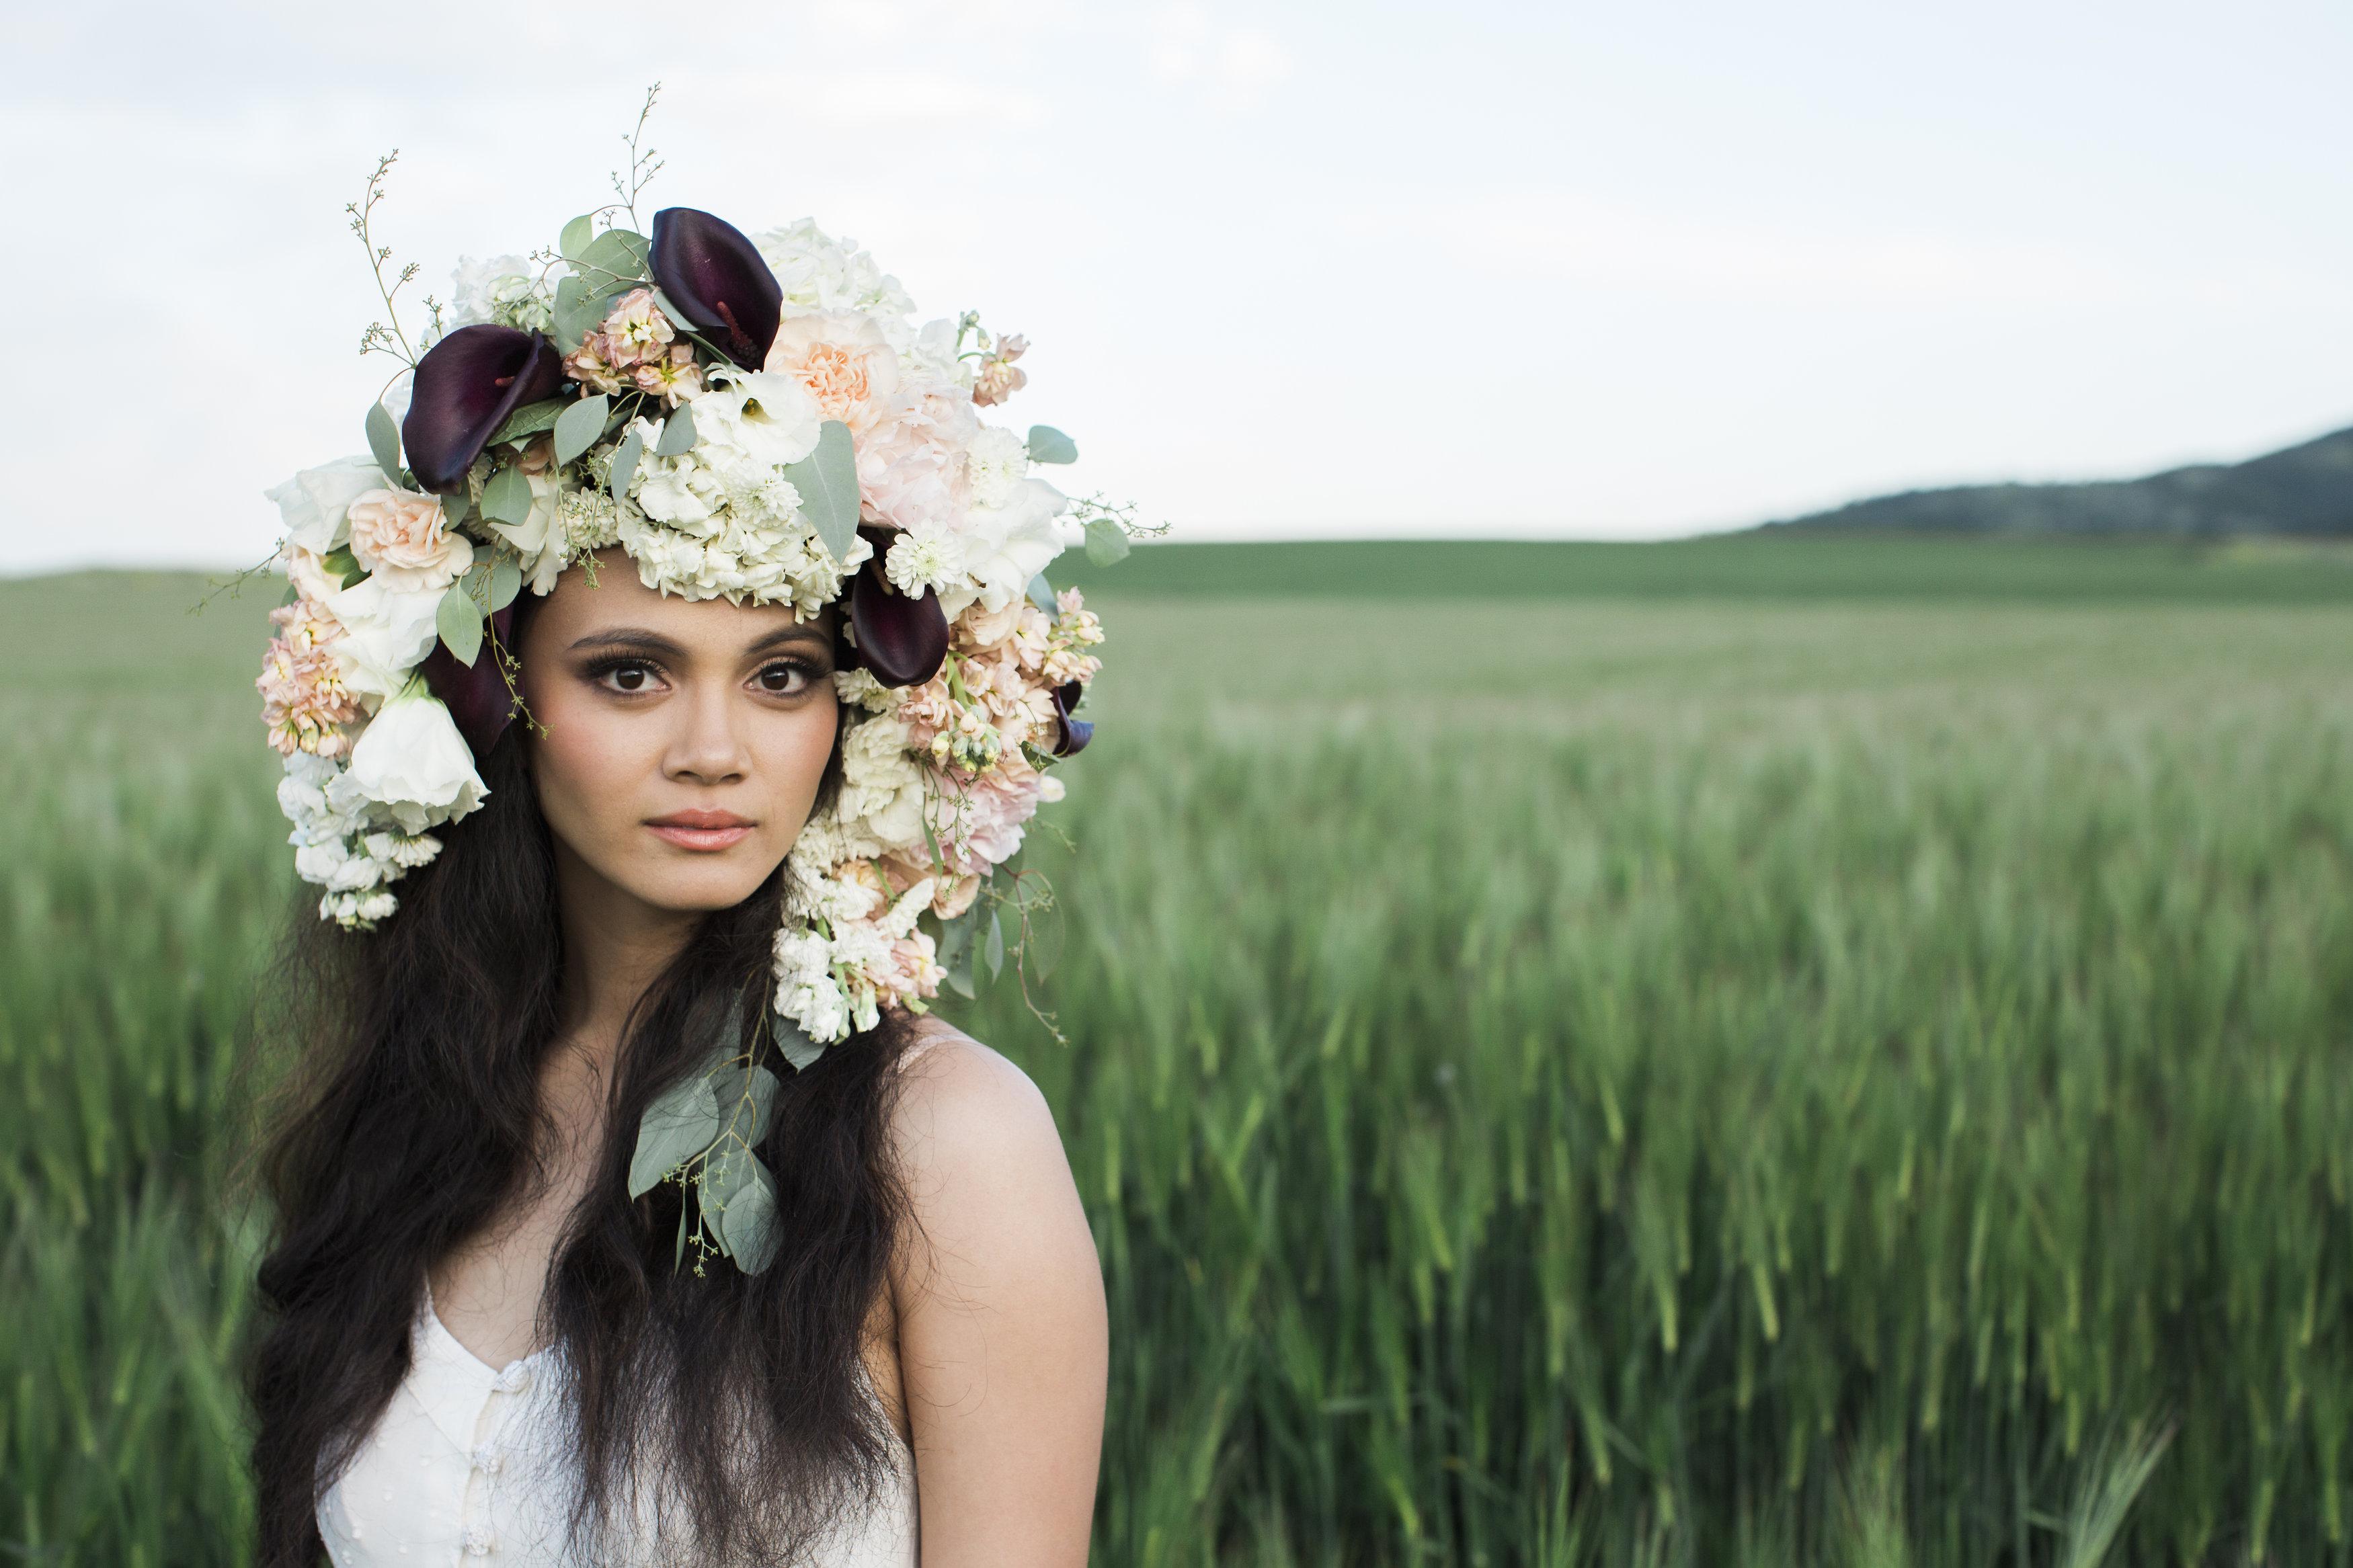 LA Beauty Portfolio | Carrie Purser Makeup and Hair Artistry